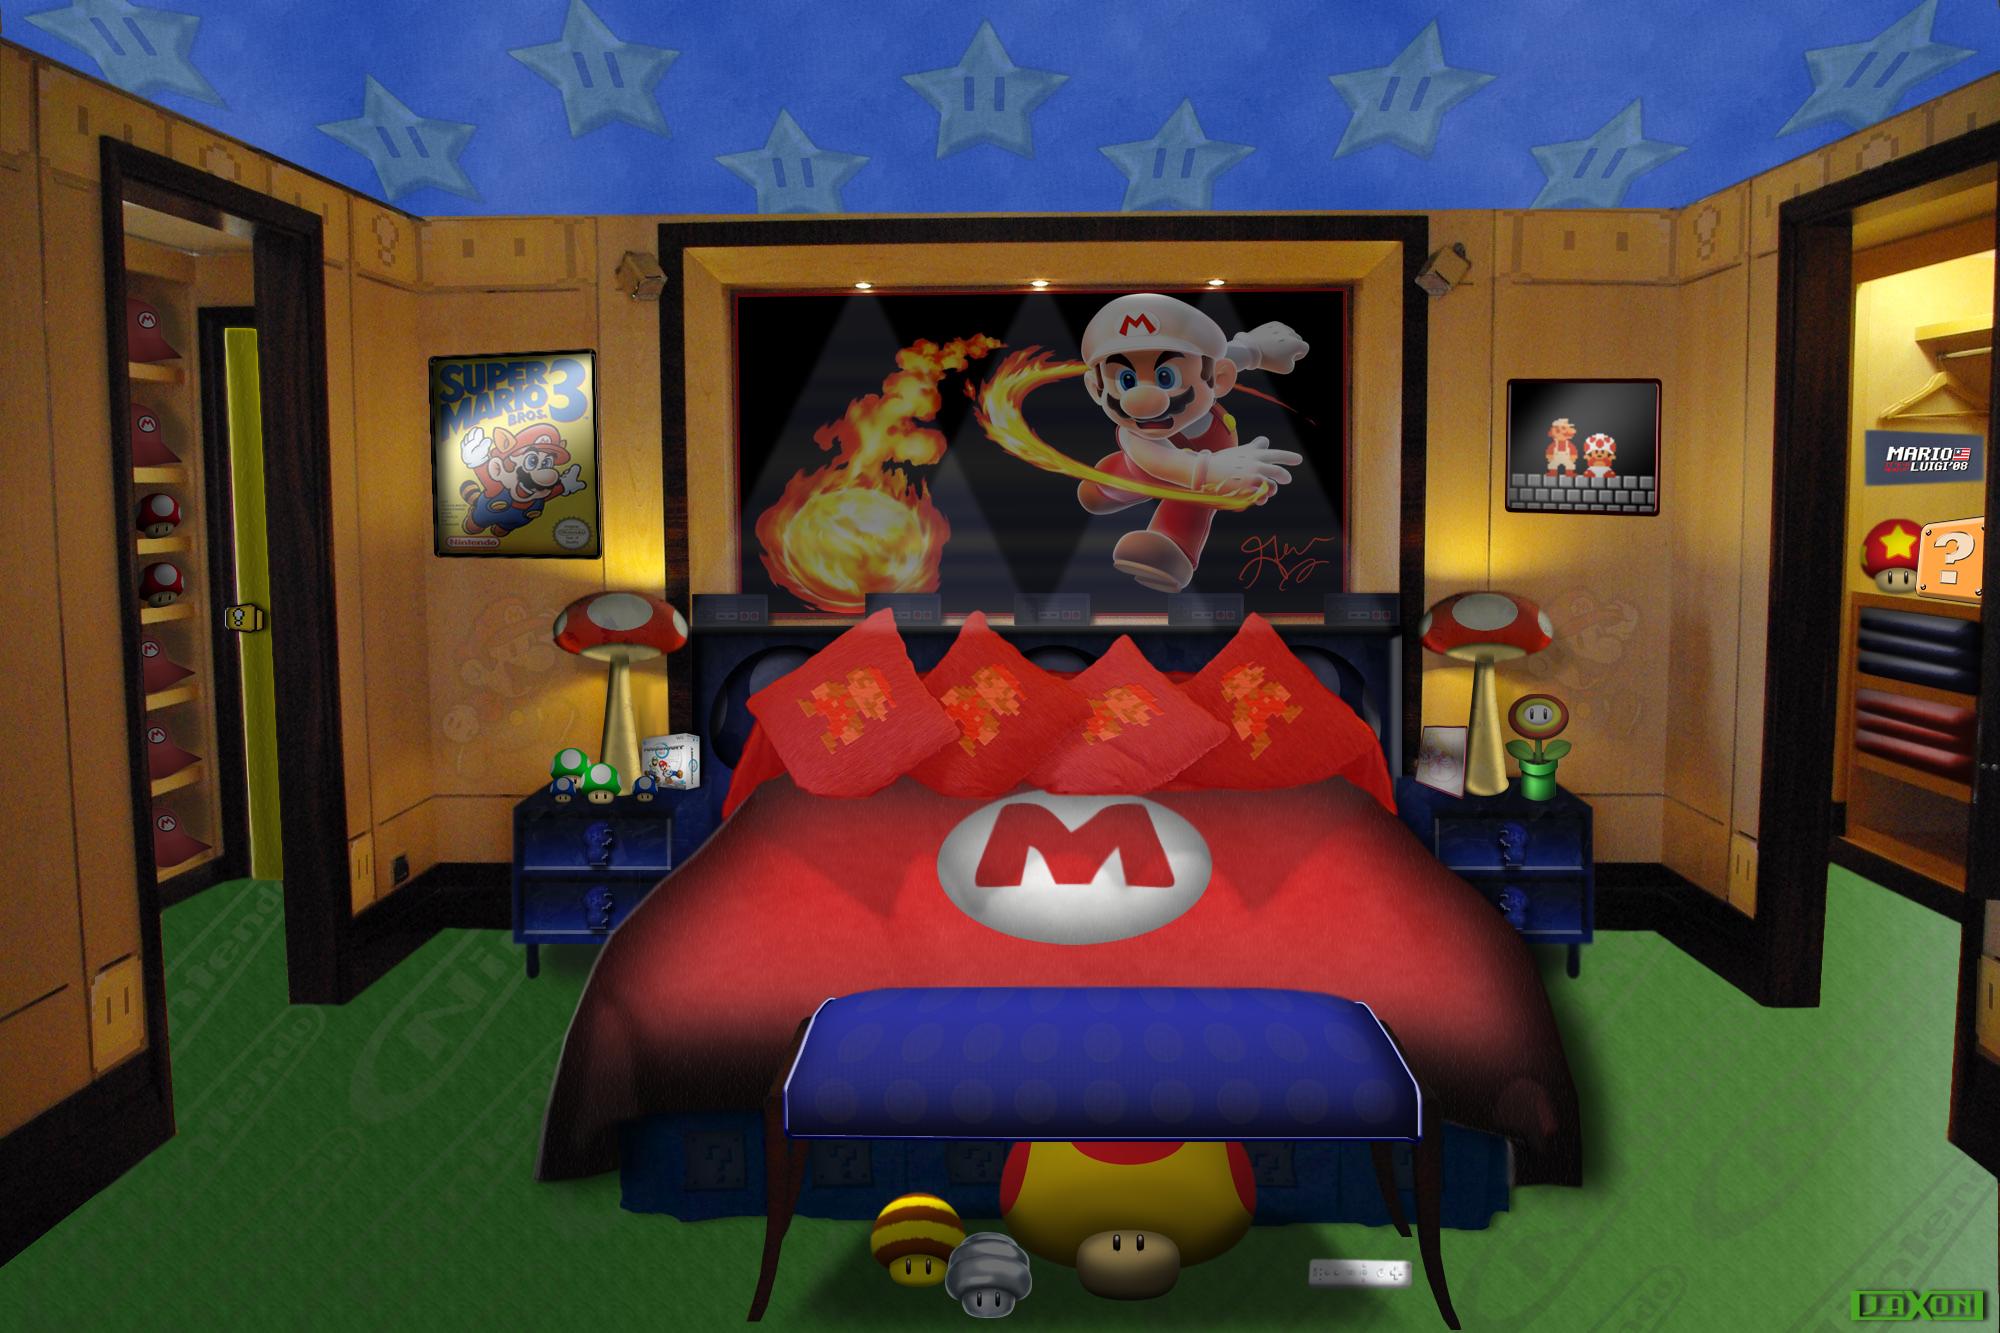 Mario themed bedroom